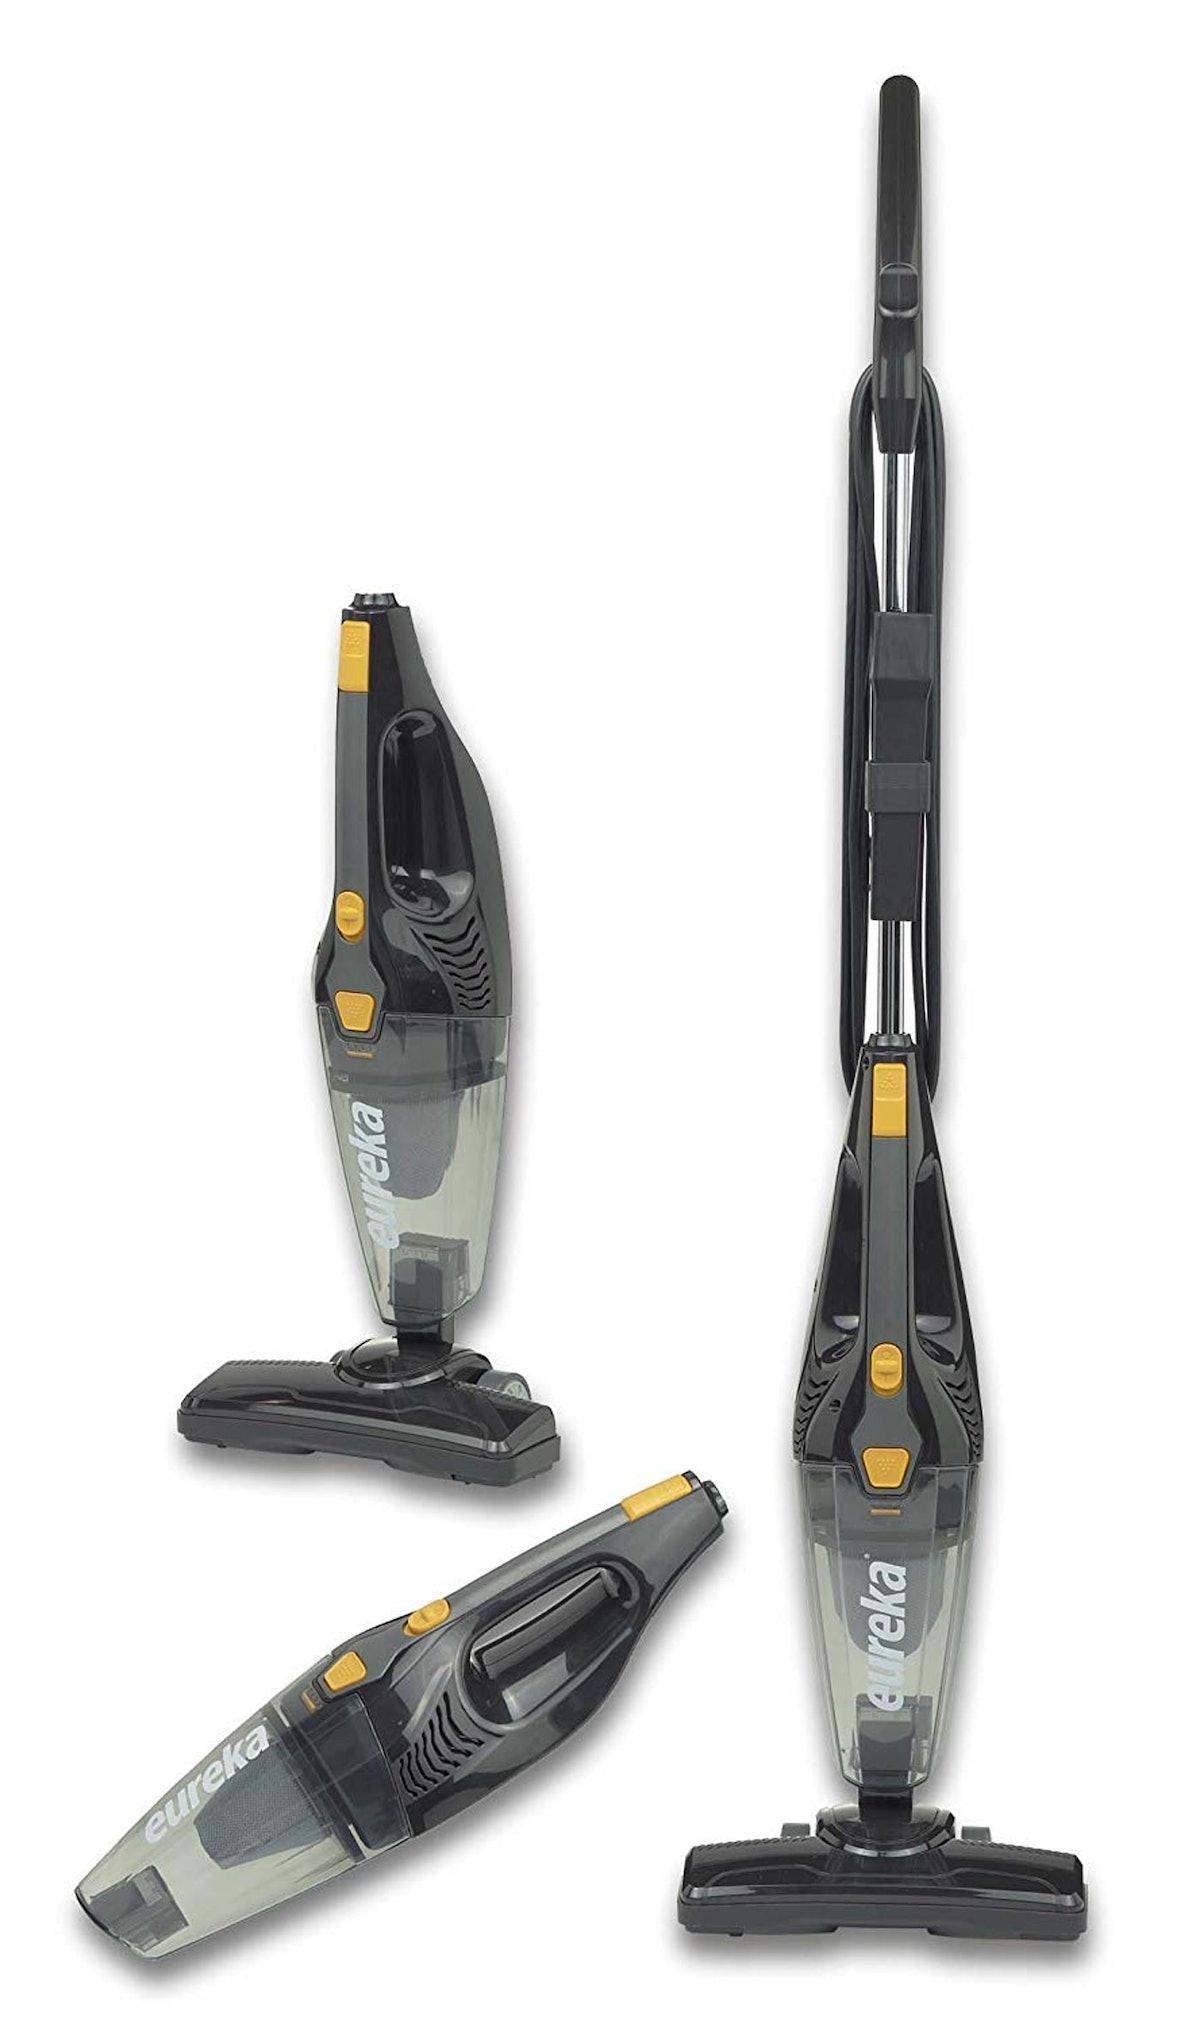 Eureka Blaze 3-in-1 Swivel Lightweight Stick Vacuum